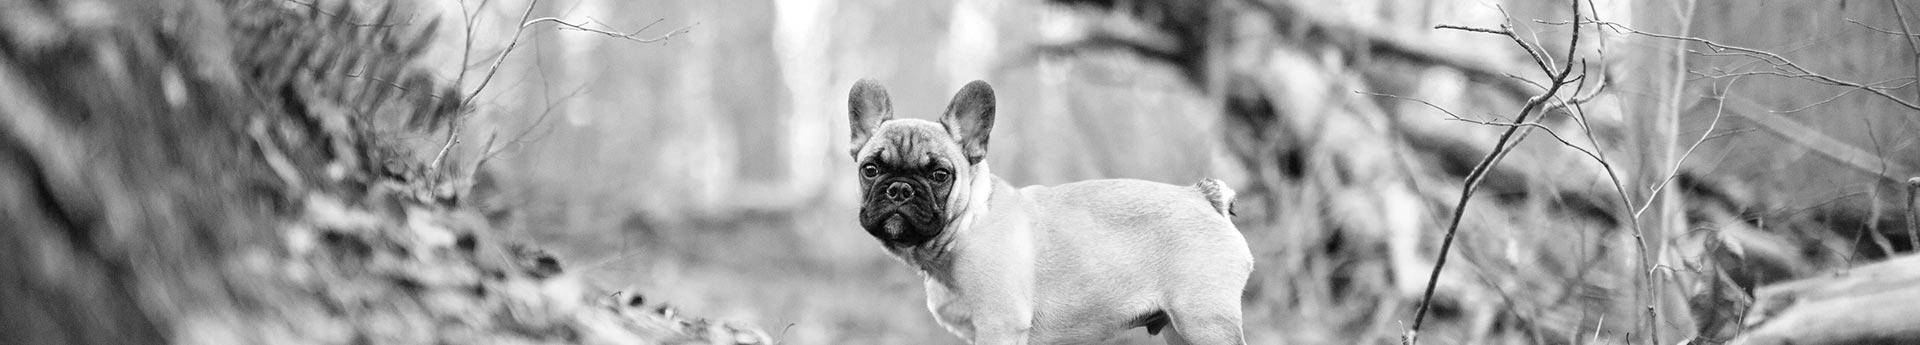 ORIJEN Puppy Dog Food - Boxer standing proud in woods - Reflective Echo from Laurel, Maryland